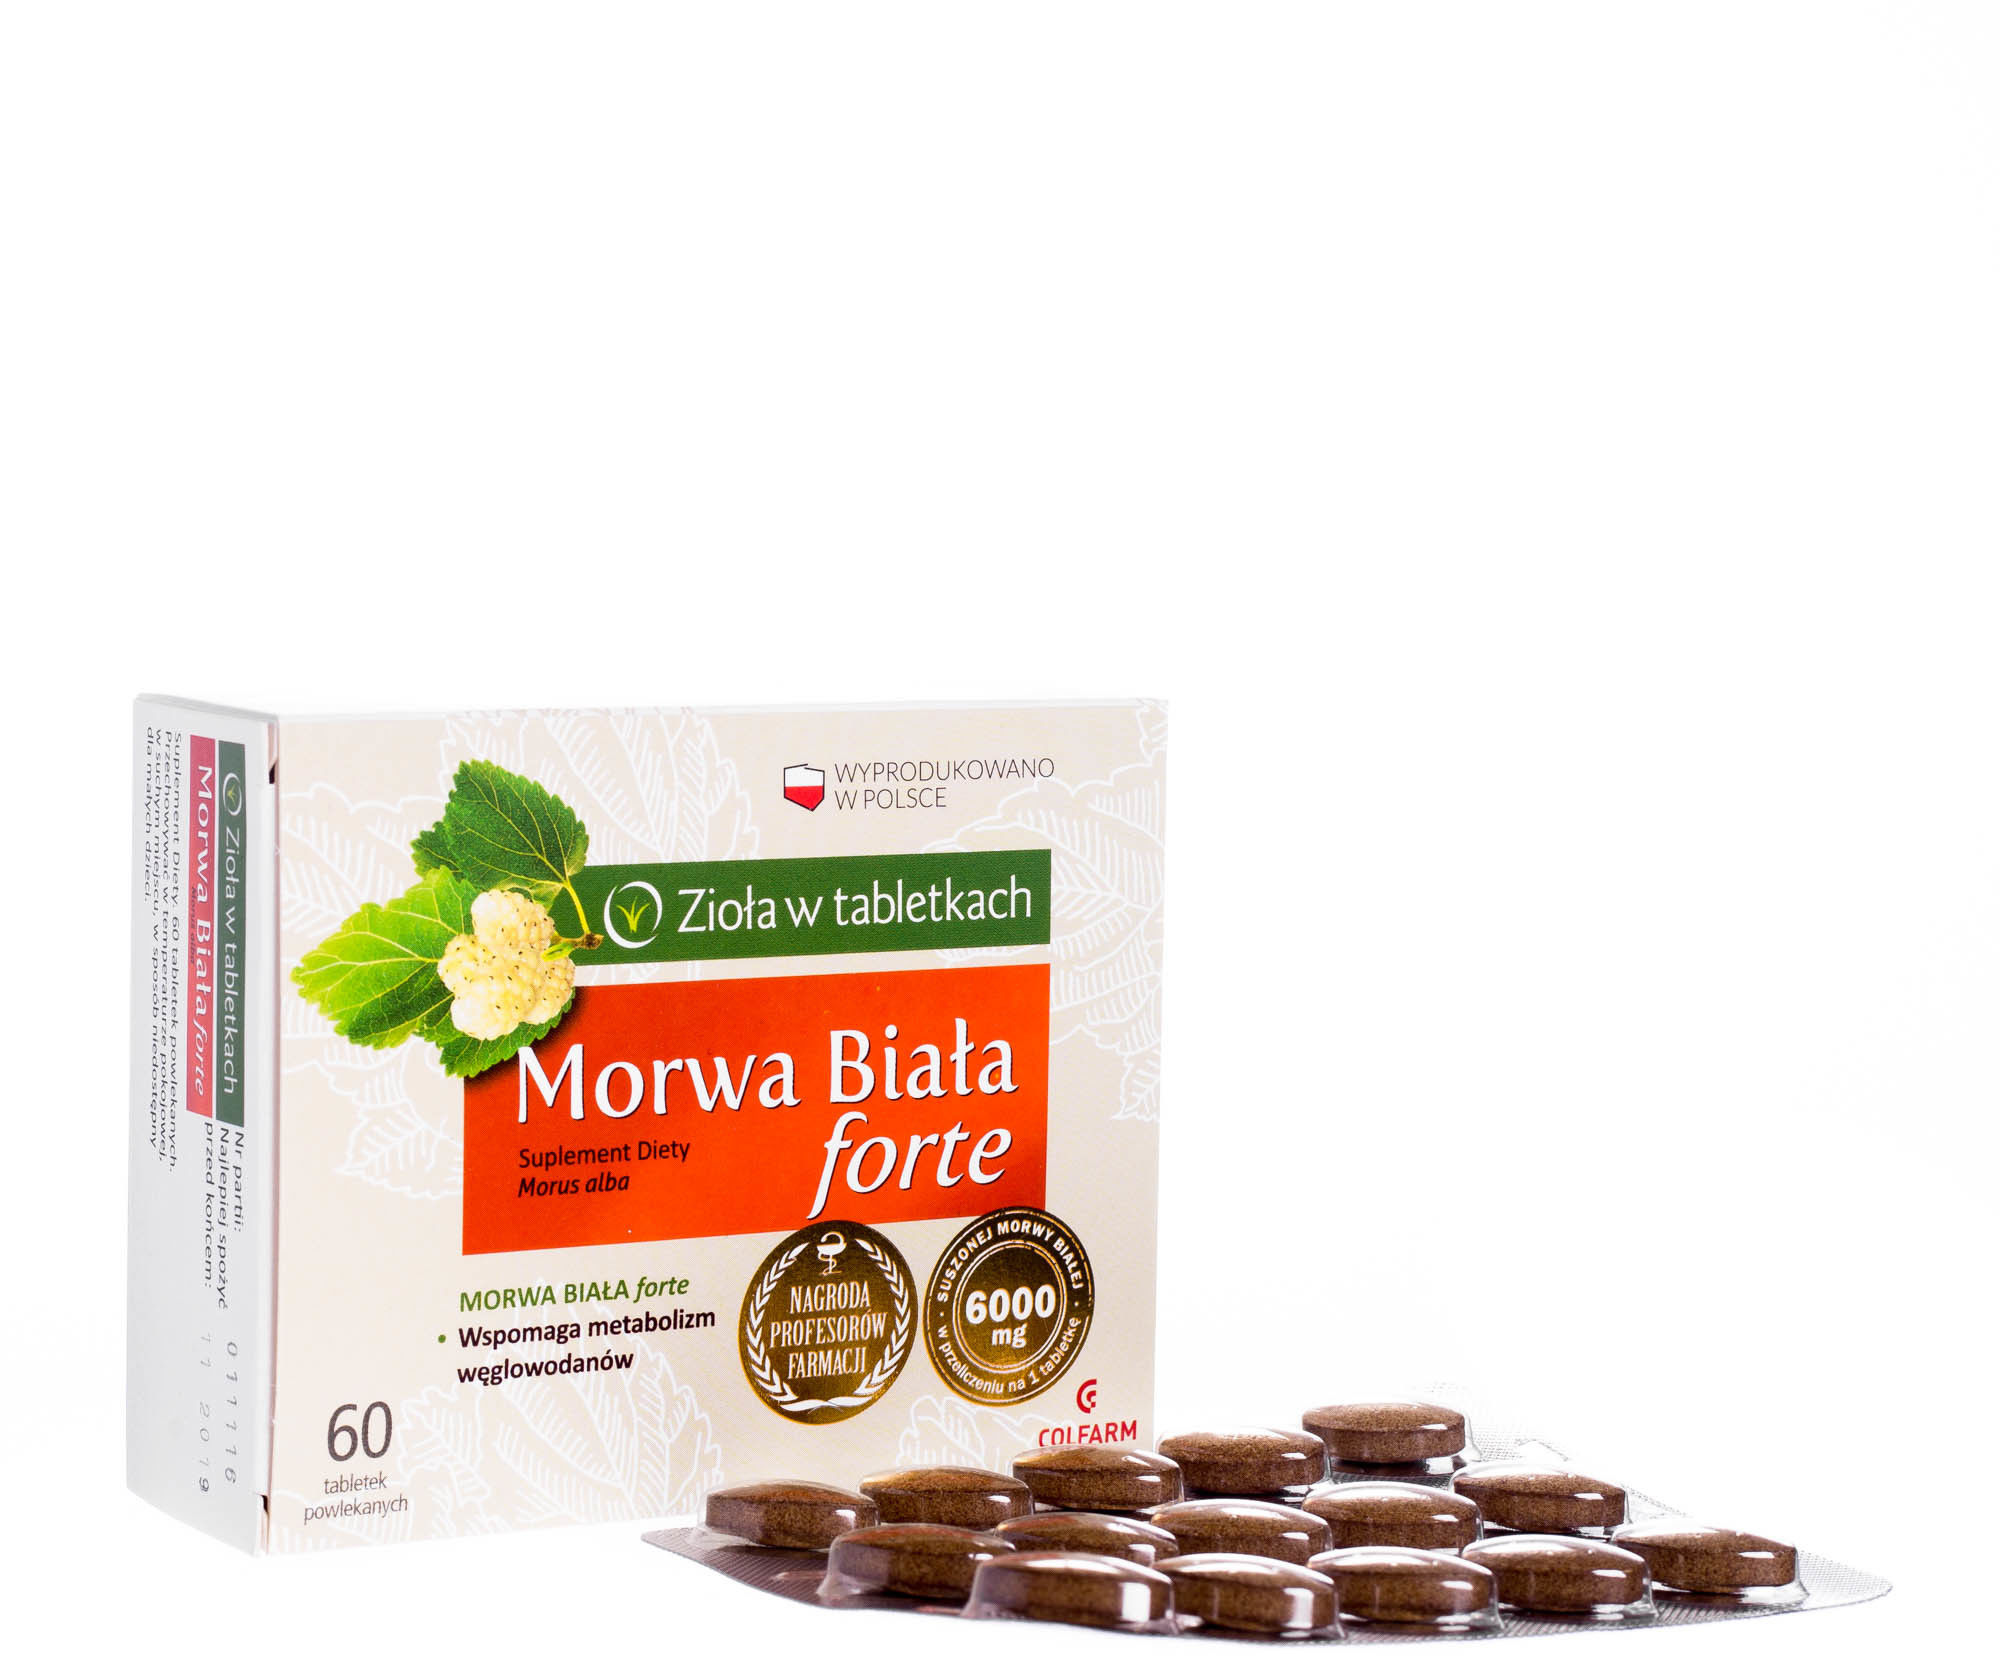 Morwa Biała Forte, 60 tabletek /Colfarm/